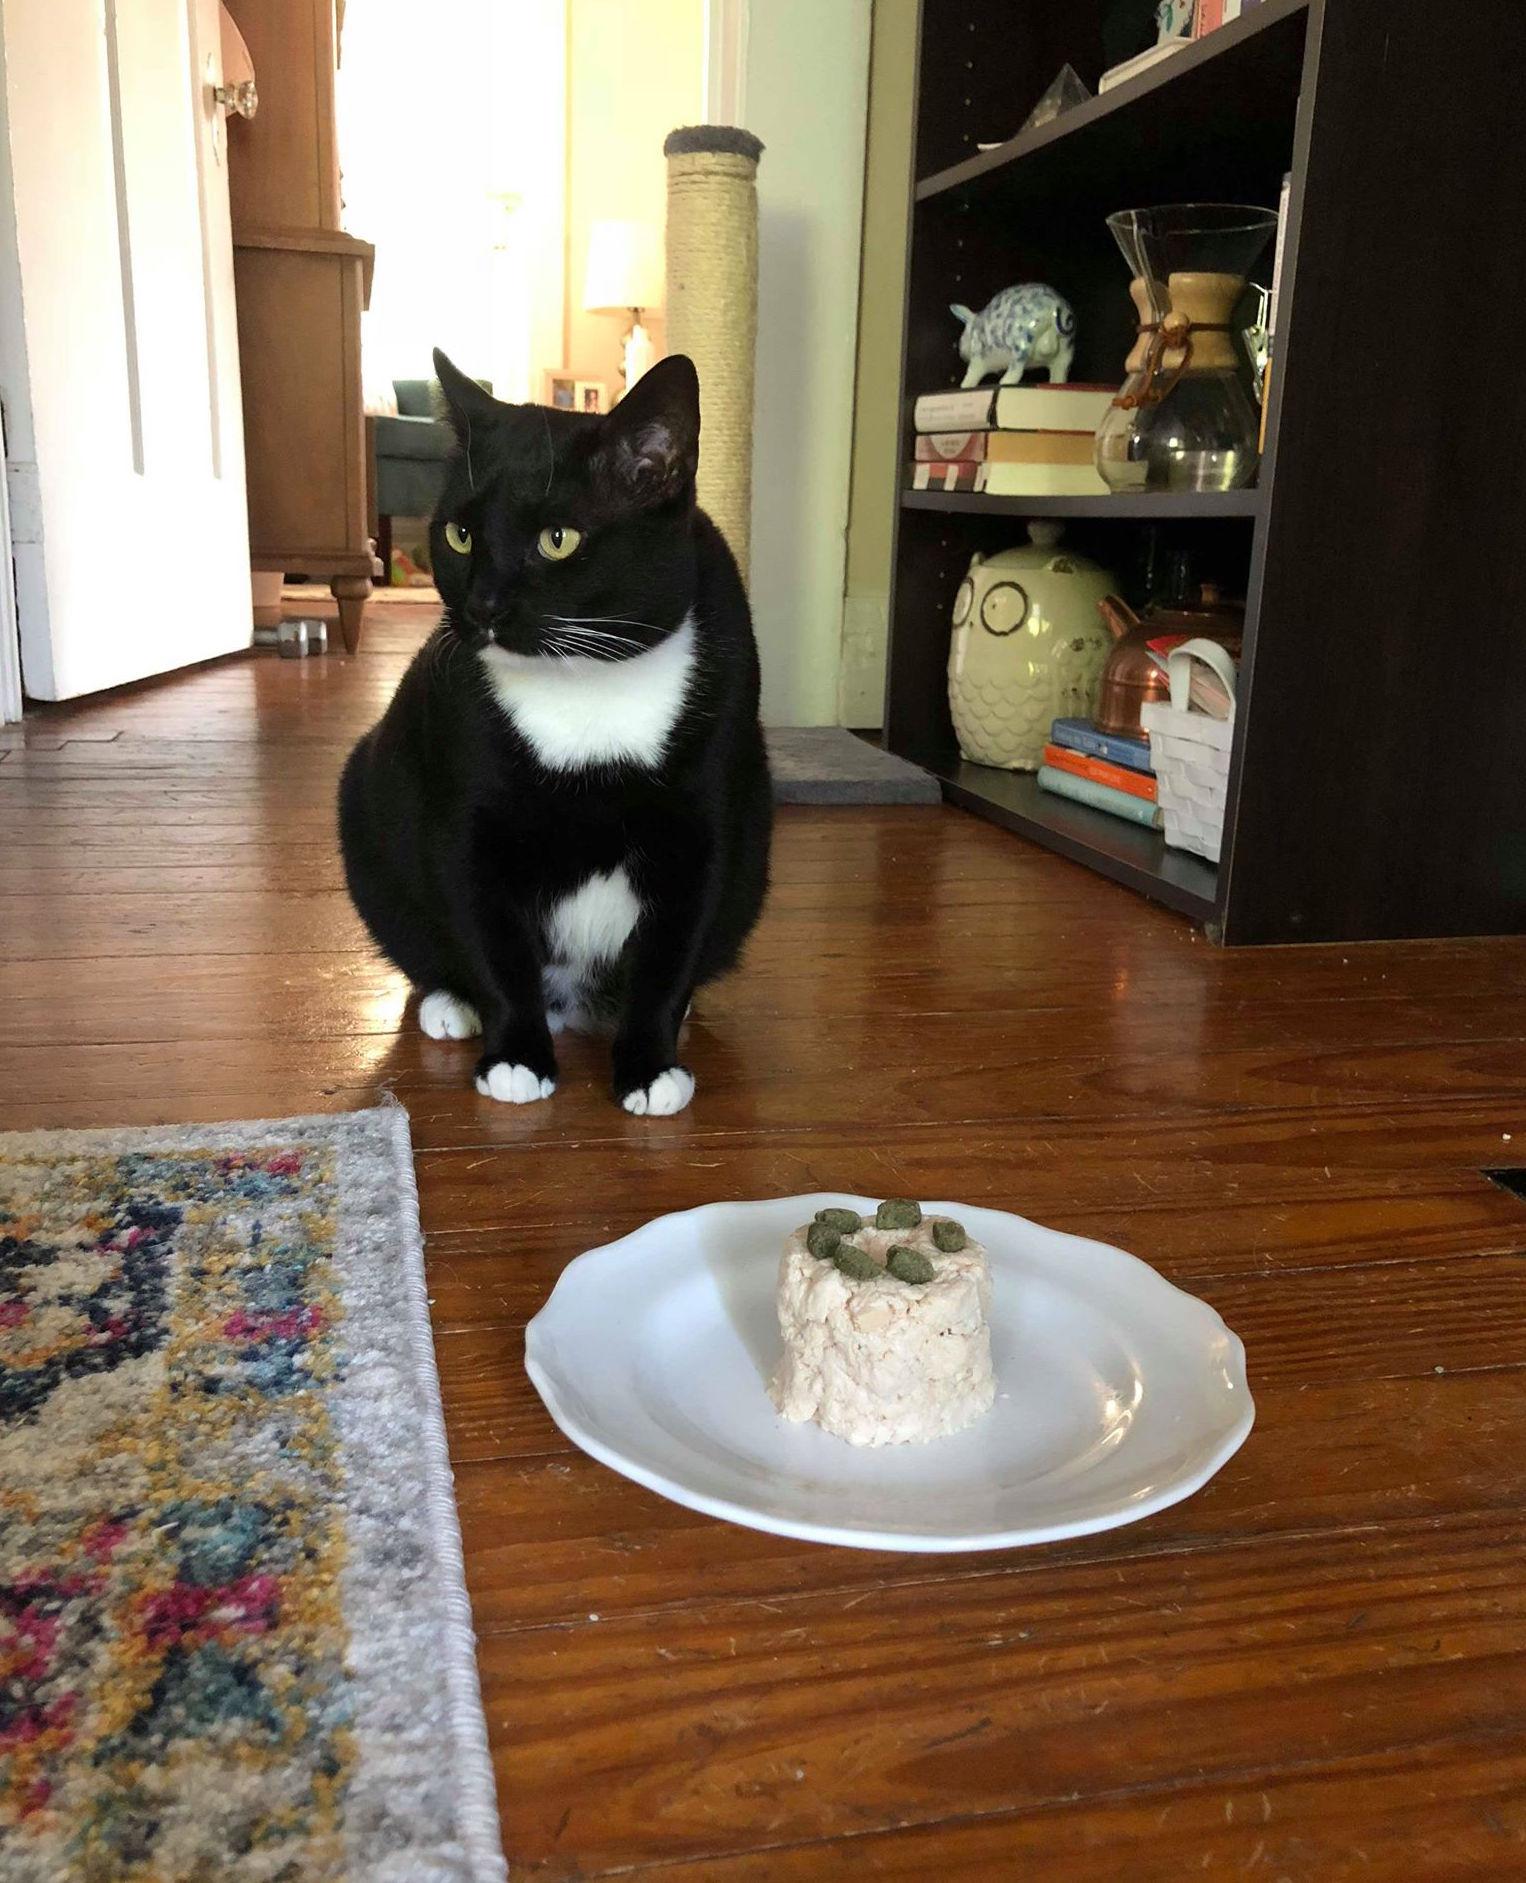 Cat-Friendly Birthday Cake Image